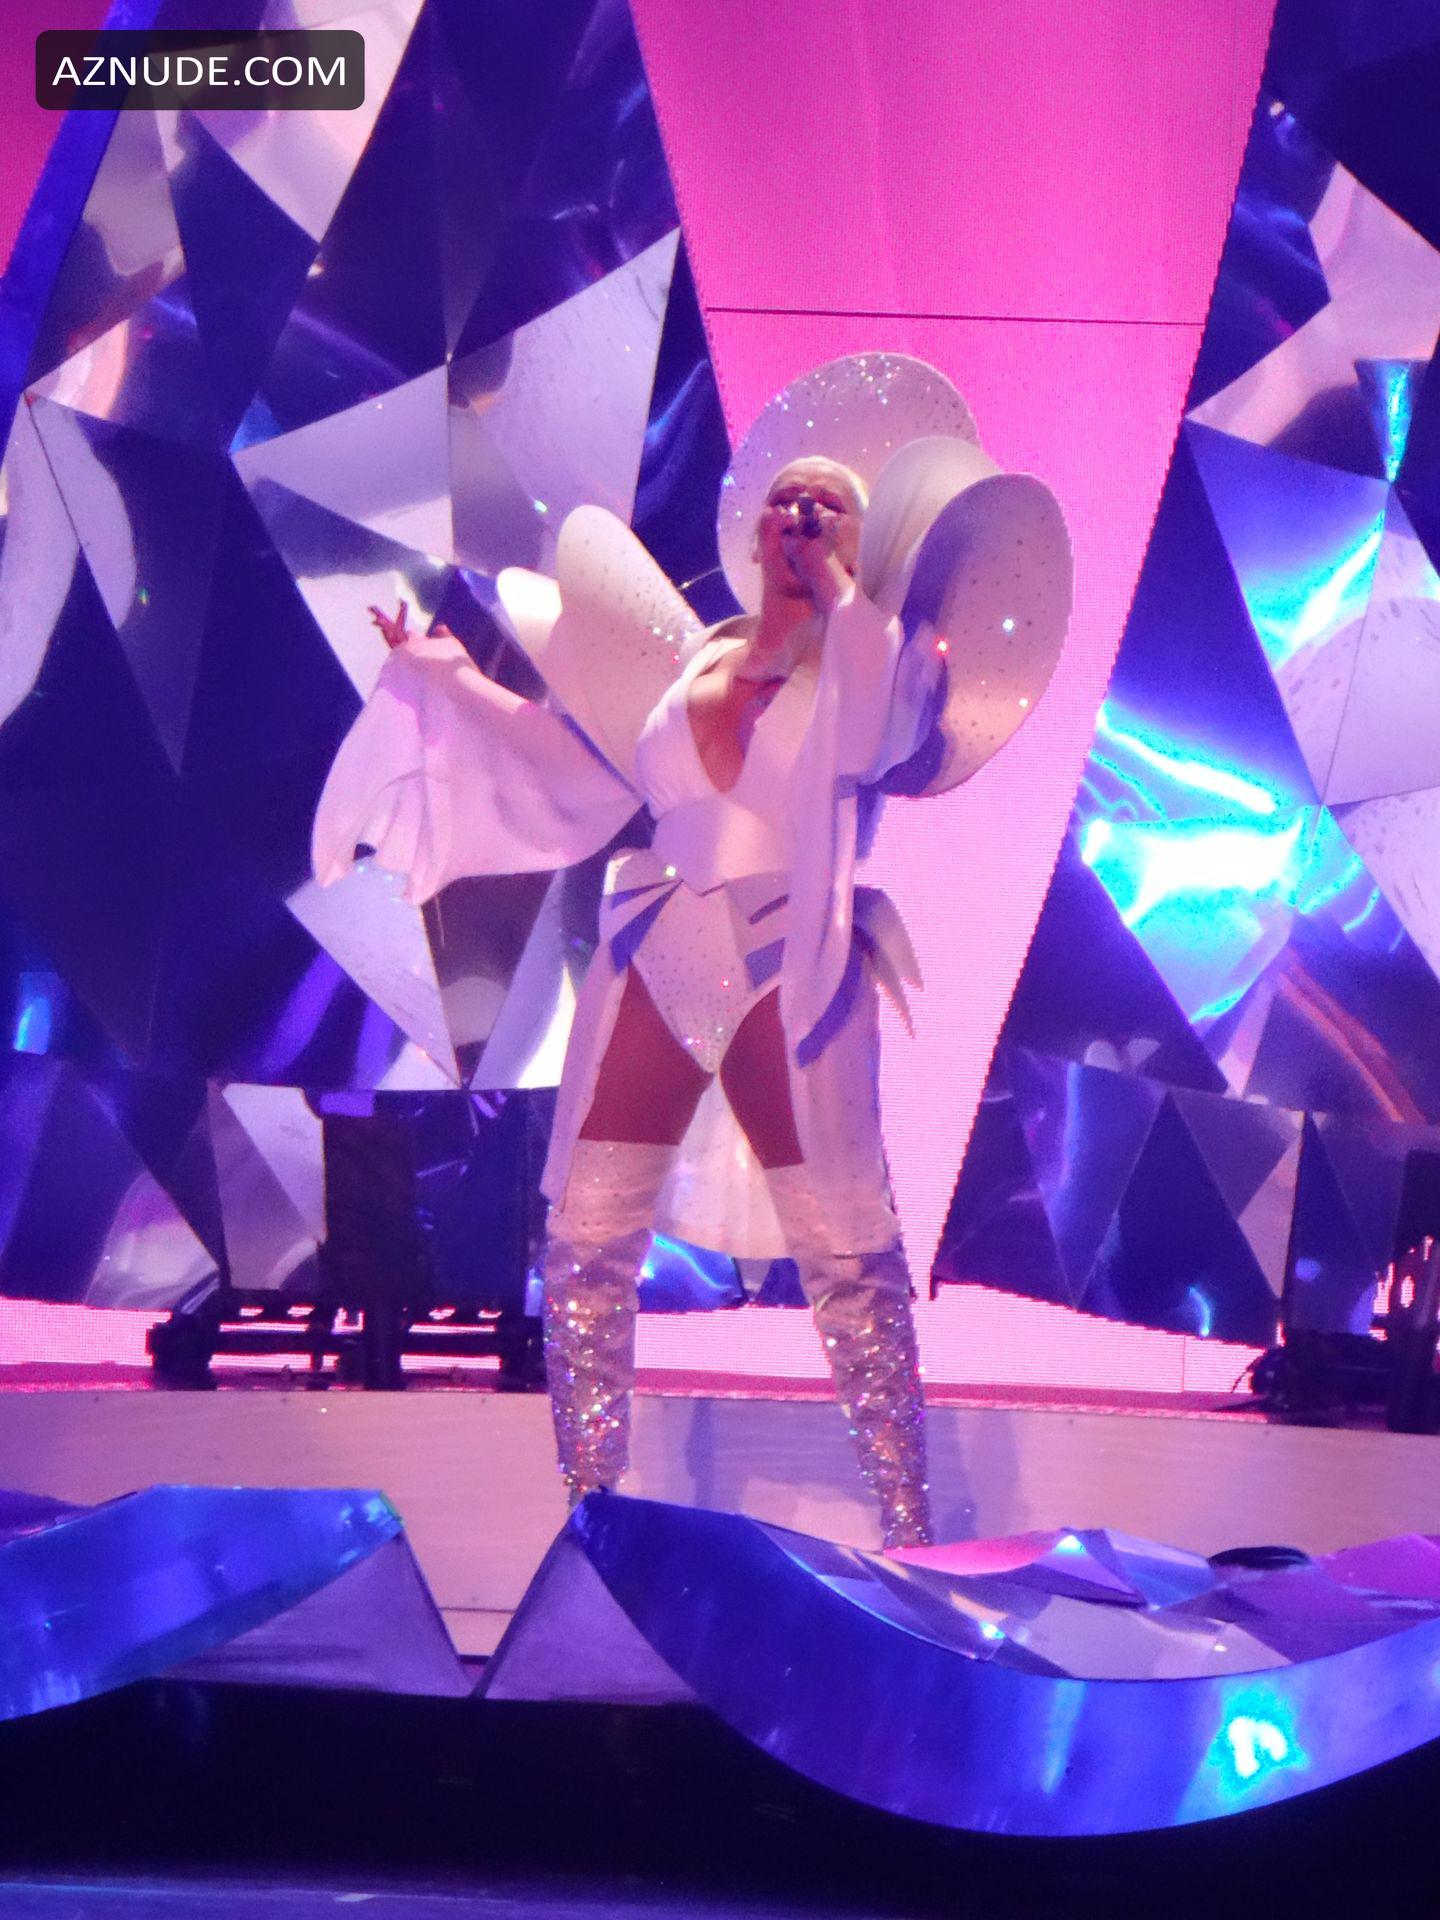 Tits Christina Aguilera Naked Ass Jpg